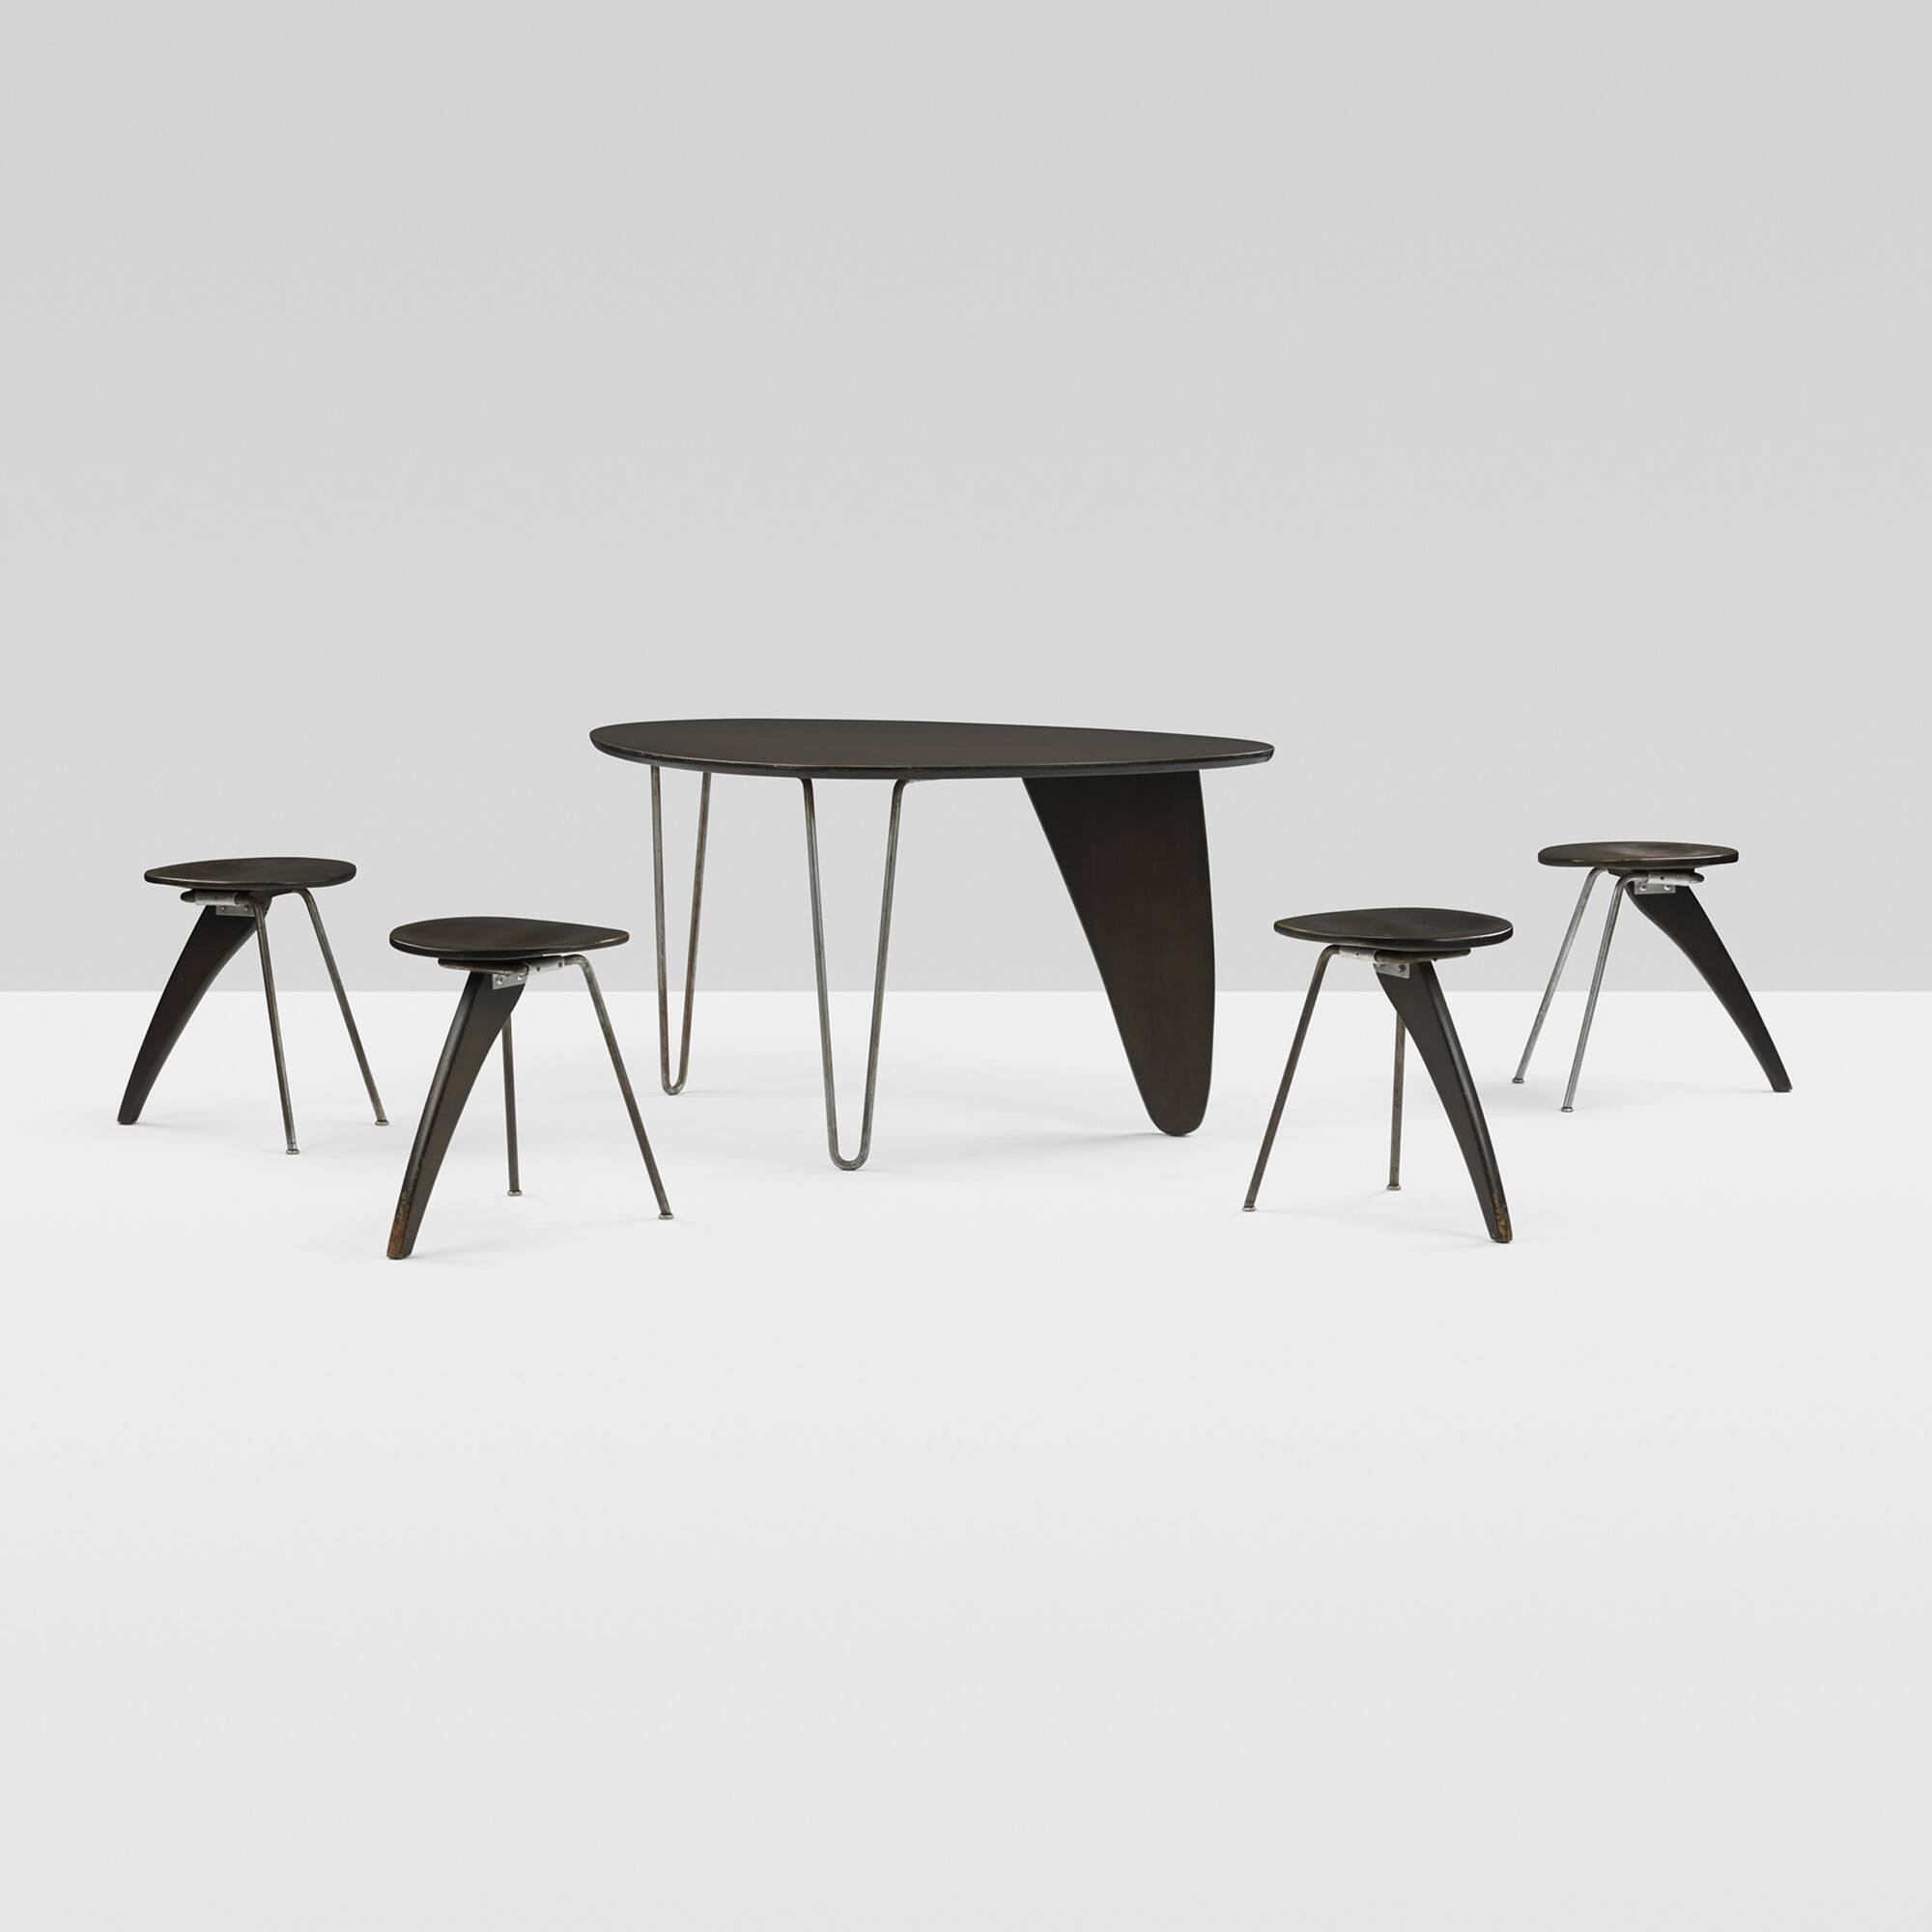 chair experimental design leggett and platt parts 129 isamu noguchi rare important rudder dining suite